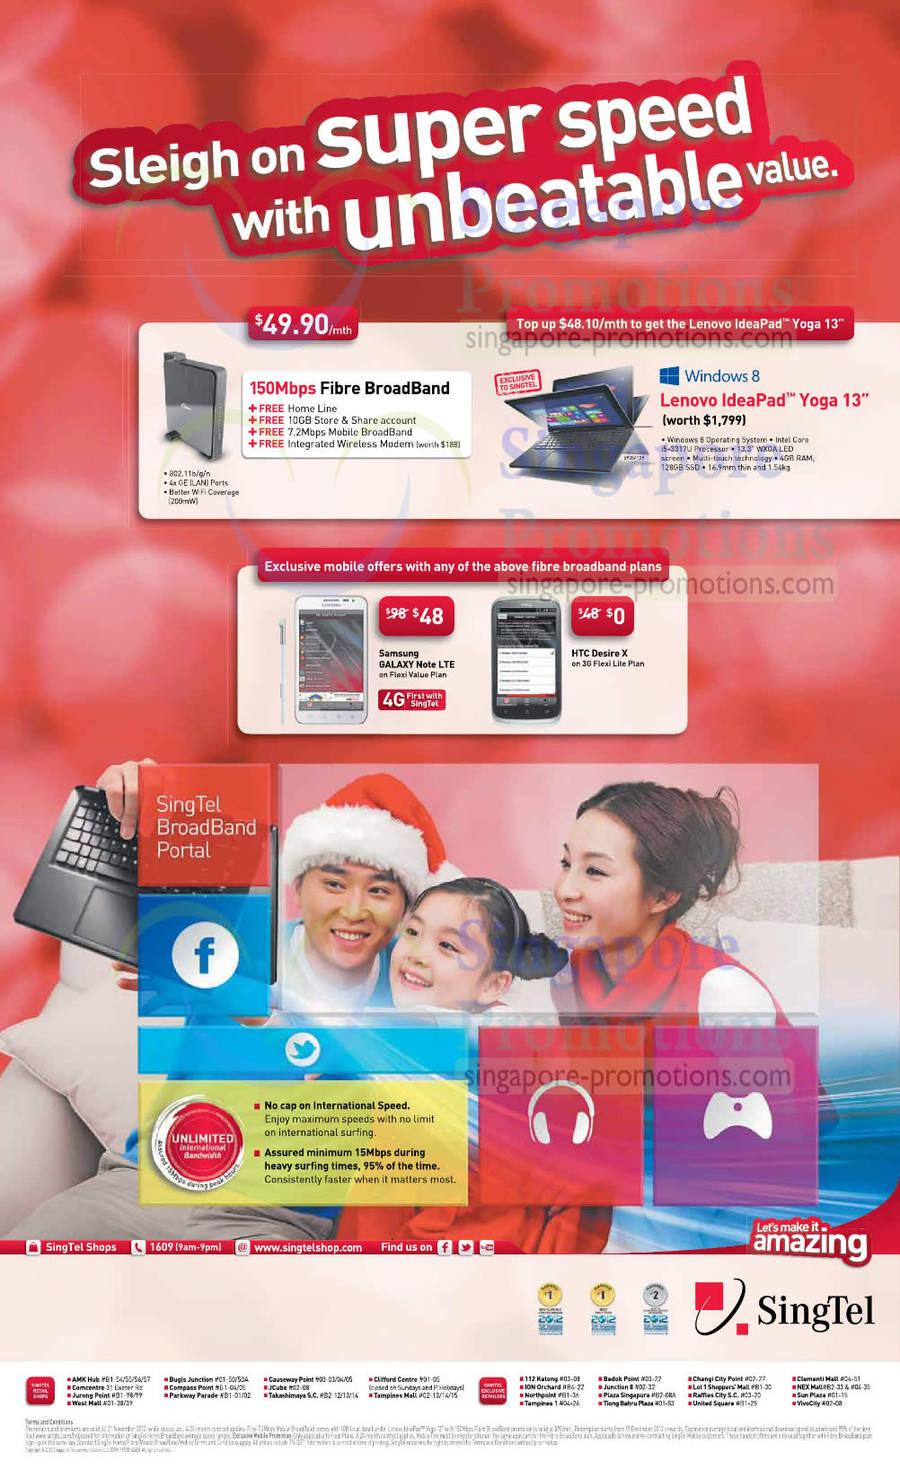 49.90 150Mbps Fibre Broadband, Fixed Line, Free Lenovo Ideapad Yoga 13 Ultrabook, Samsung Galaxy Note LTE, HTC Desire X